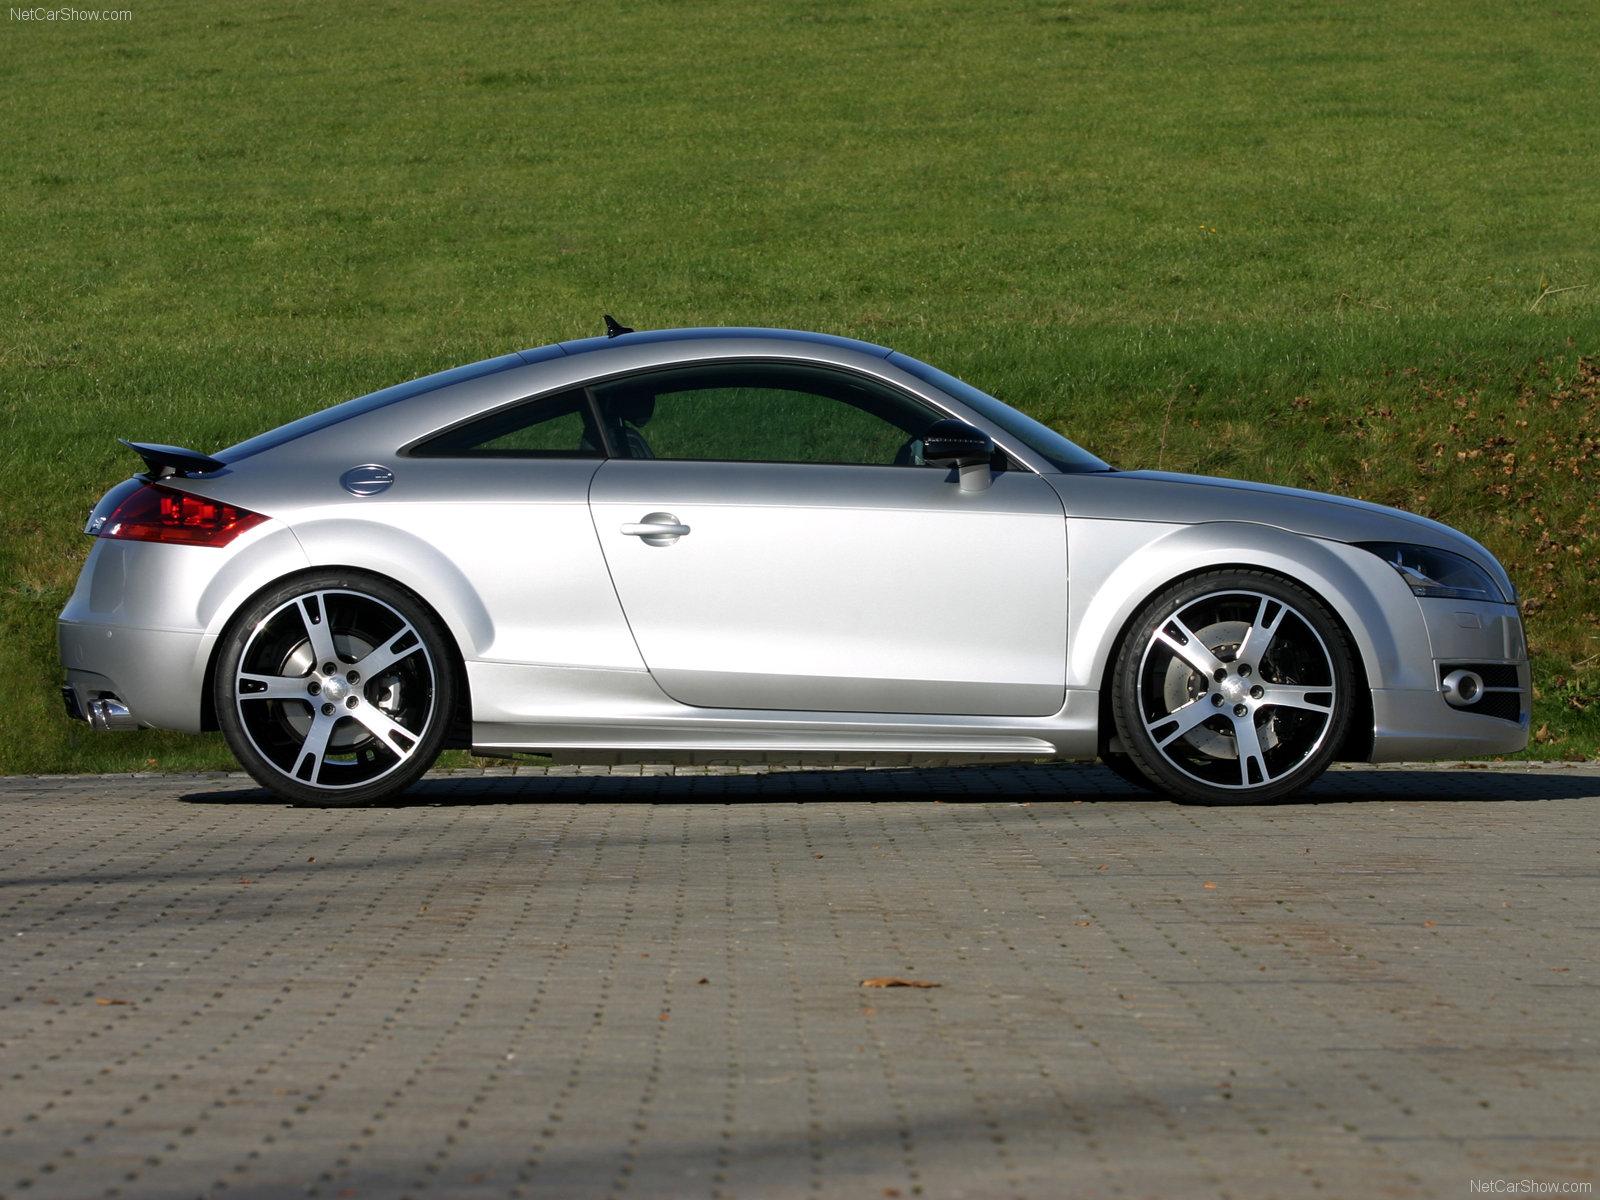 http://3.bp.blogspot.com/-HYLosg_6XKc/T1ImCnKwxnI/AAAAAAAAAb0/SJI4-i6-WXw/s1600/ABT-Audi_TT-R_2007_1600x1200_wallpaper_04.jpg